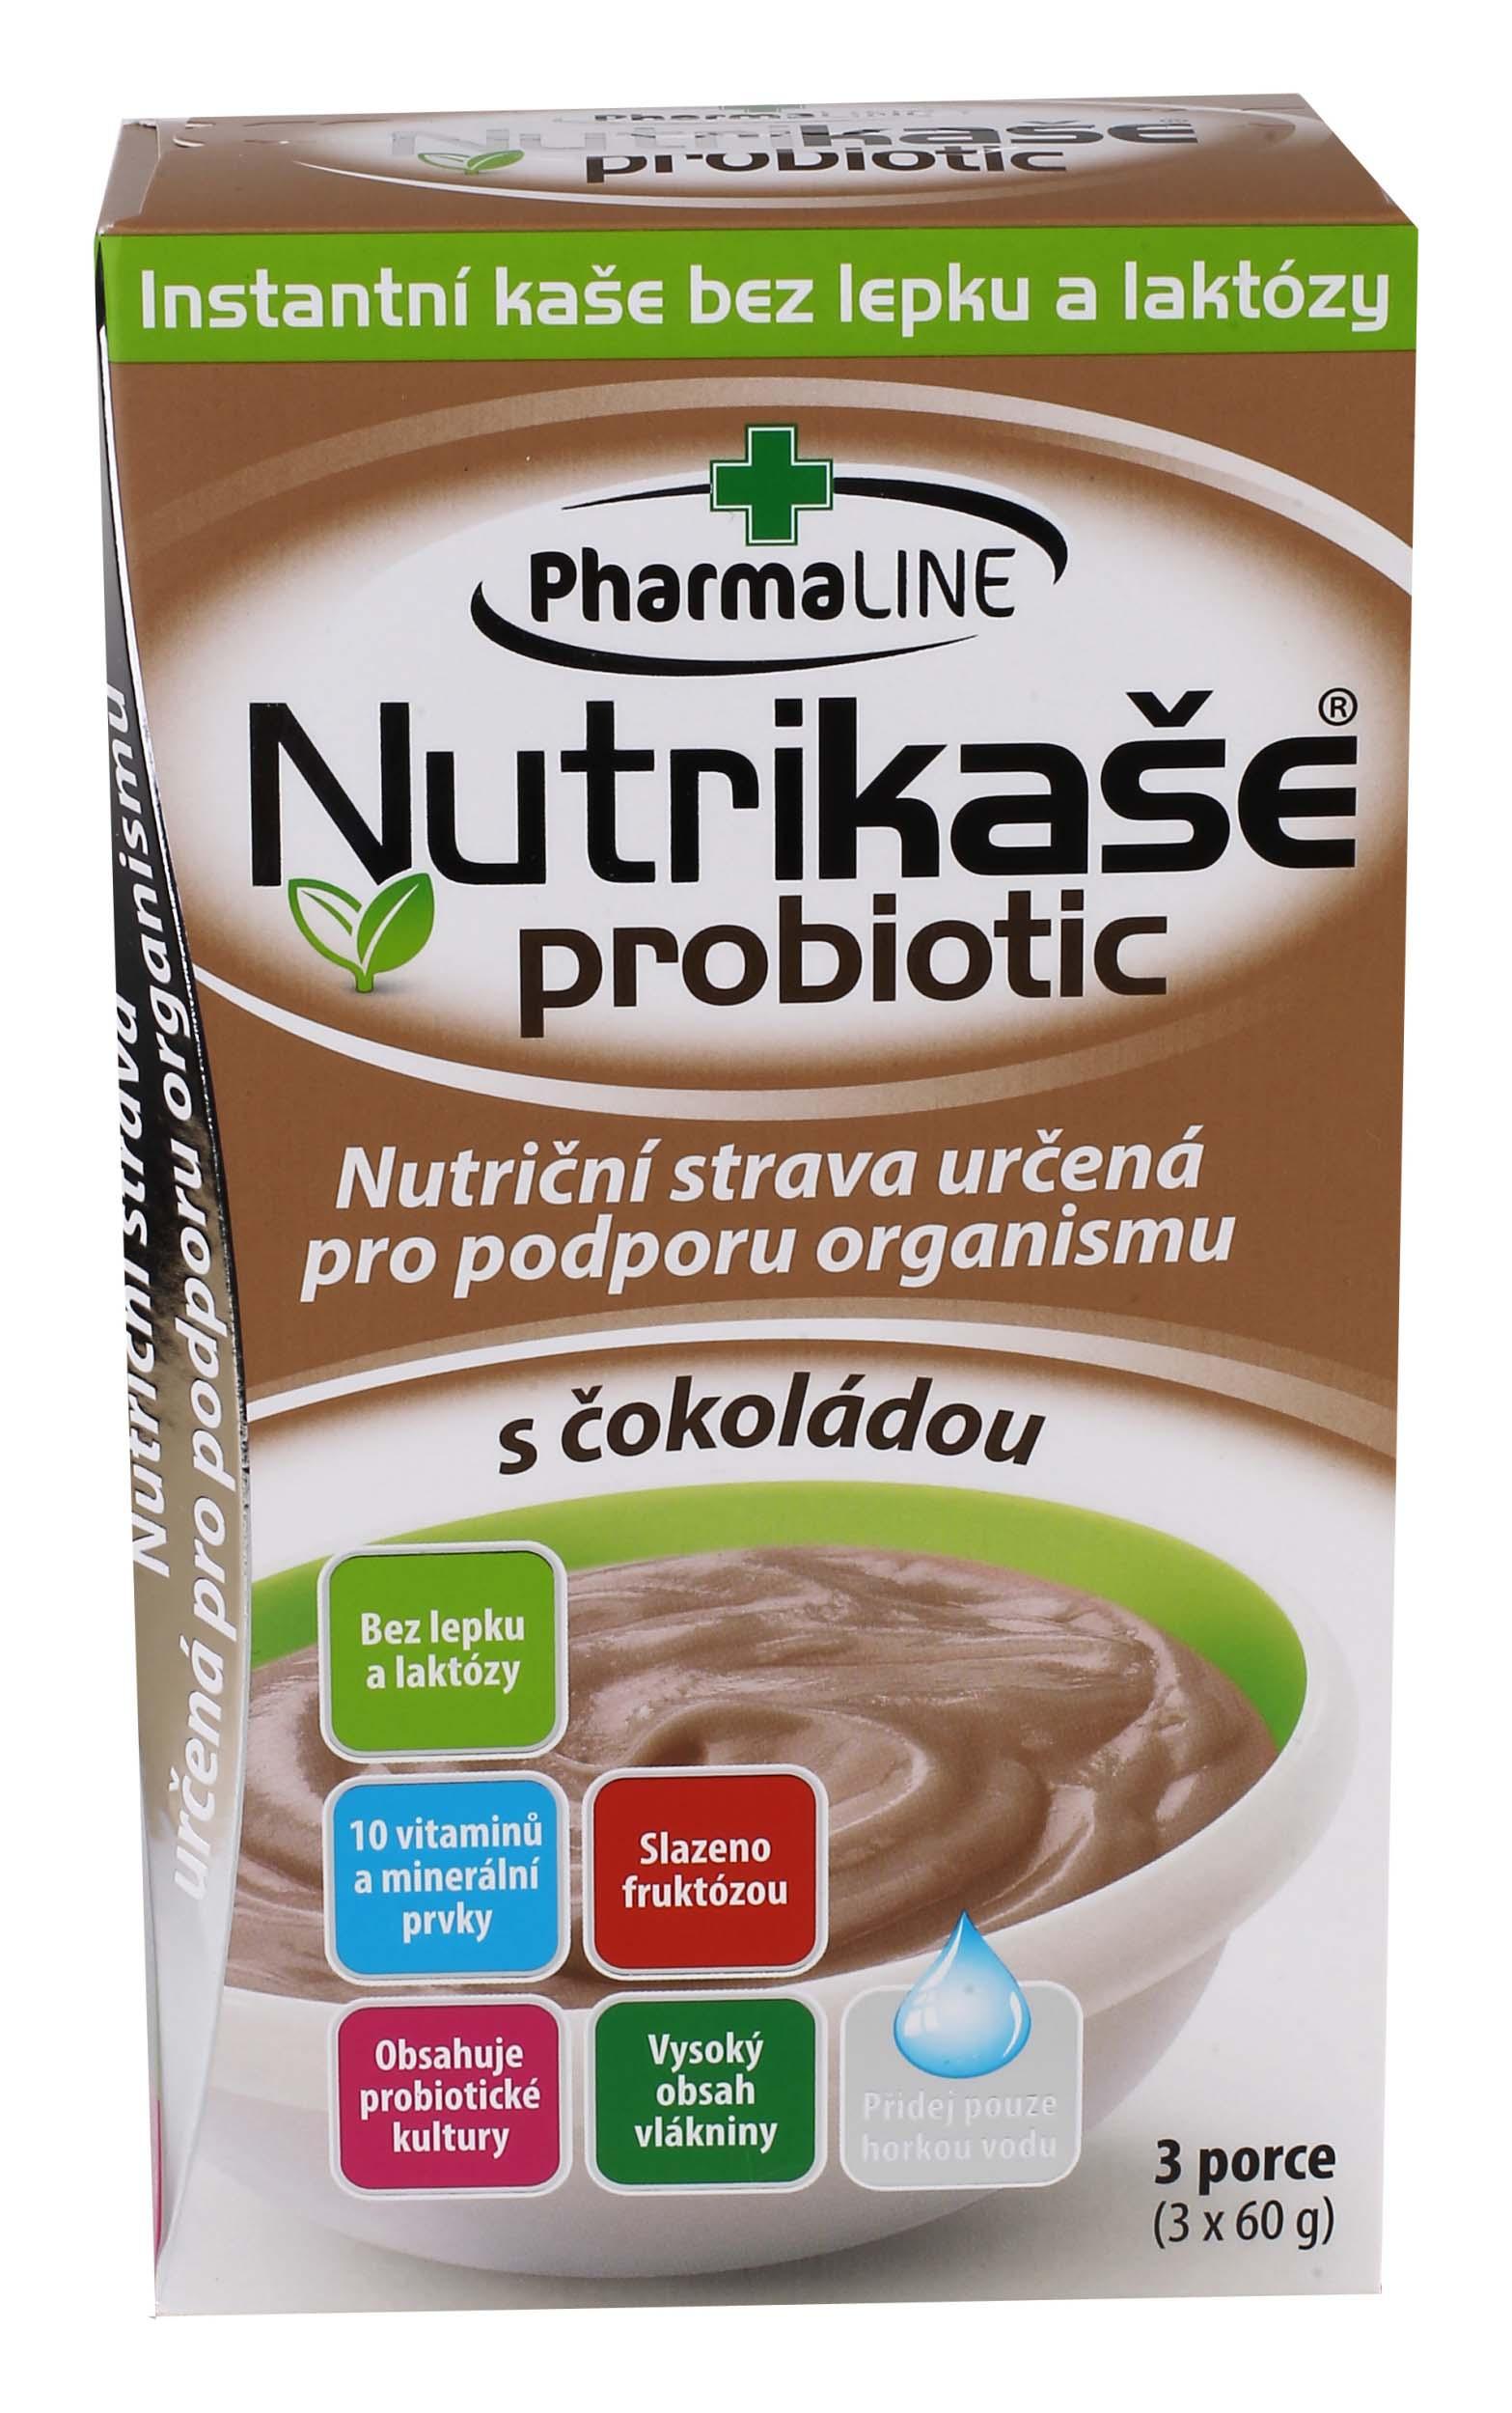 Nutrikaše probiotic – sčokoládou 180g (3x60g) bez lepku